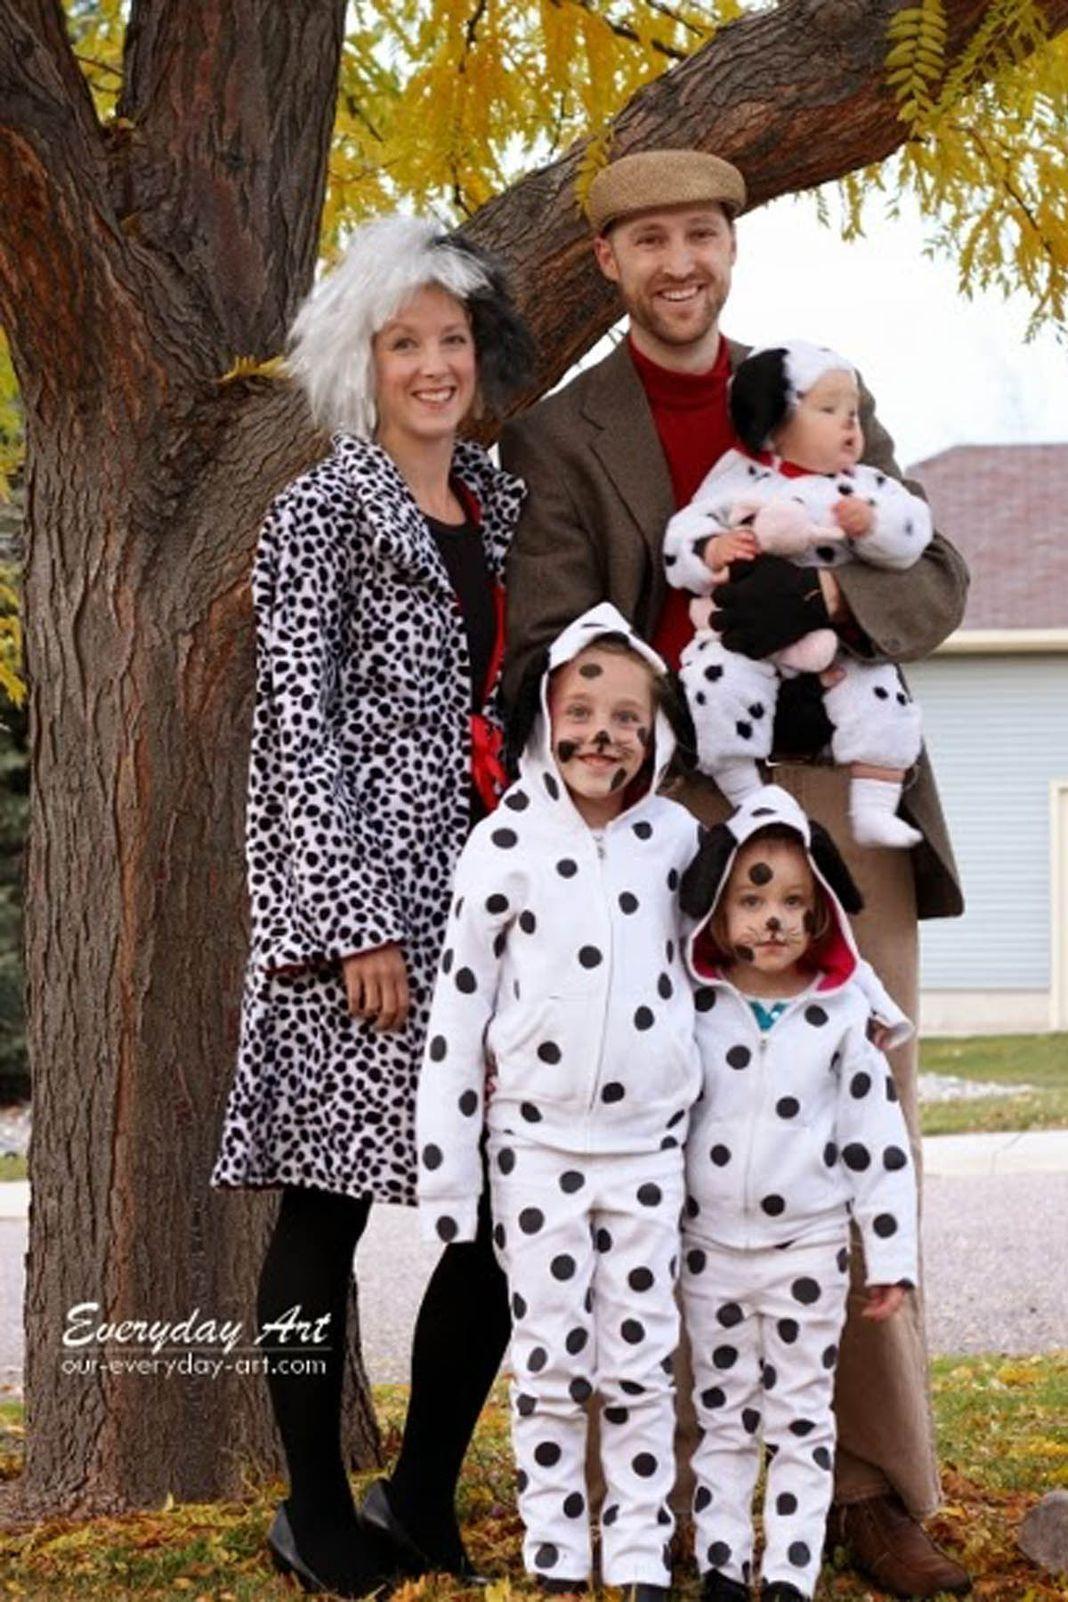 Cute Family Disney Halloween Costumes.57 Family Halloween Costumes That Ll Be The Talk Of The Neighborhood